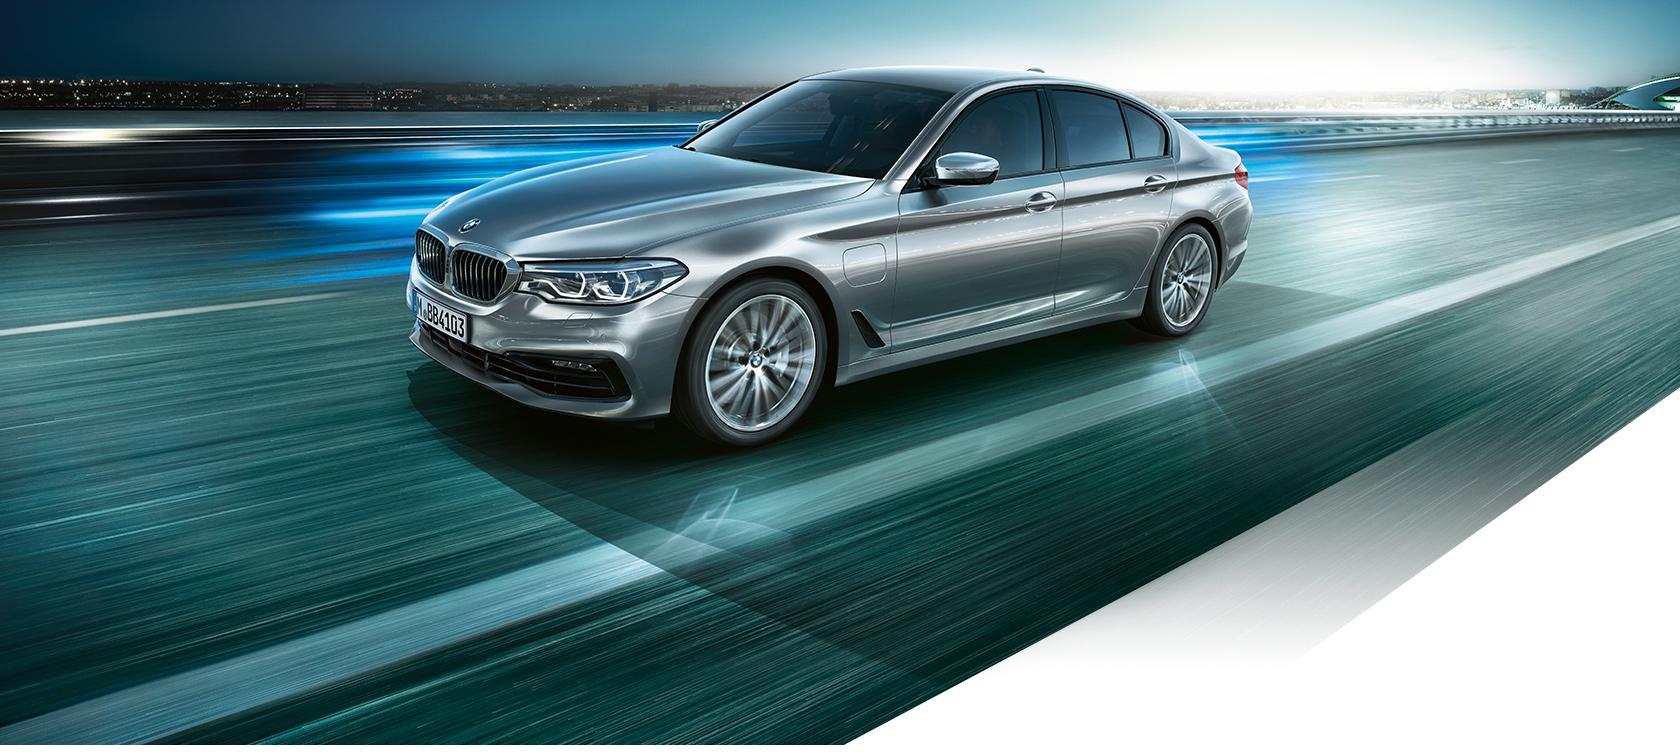 BMW 5 Series: Compatibility